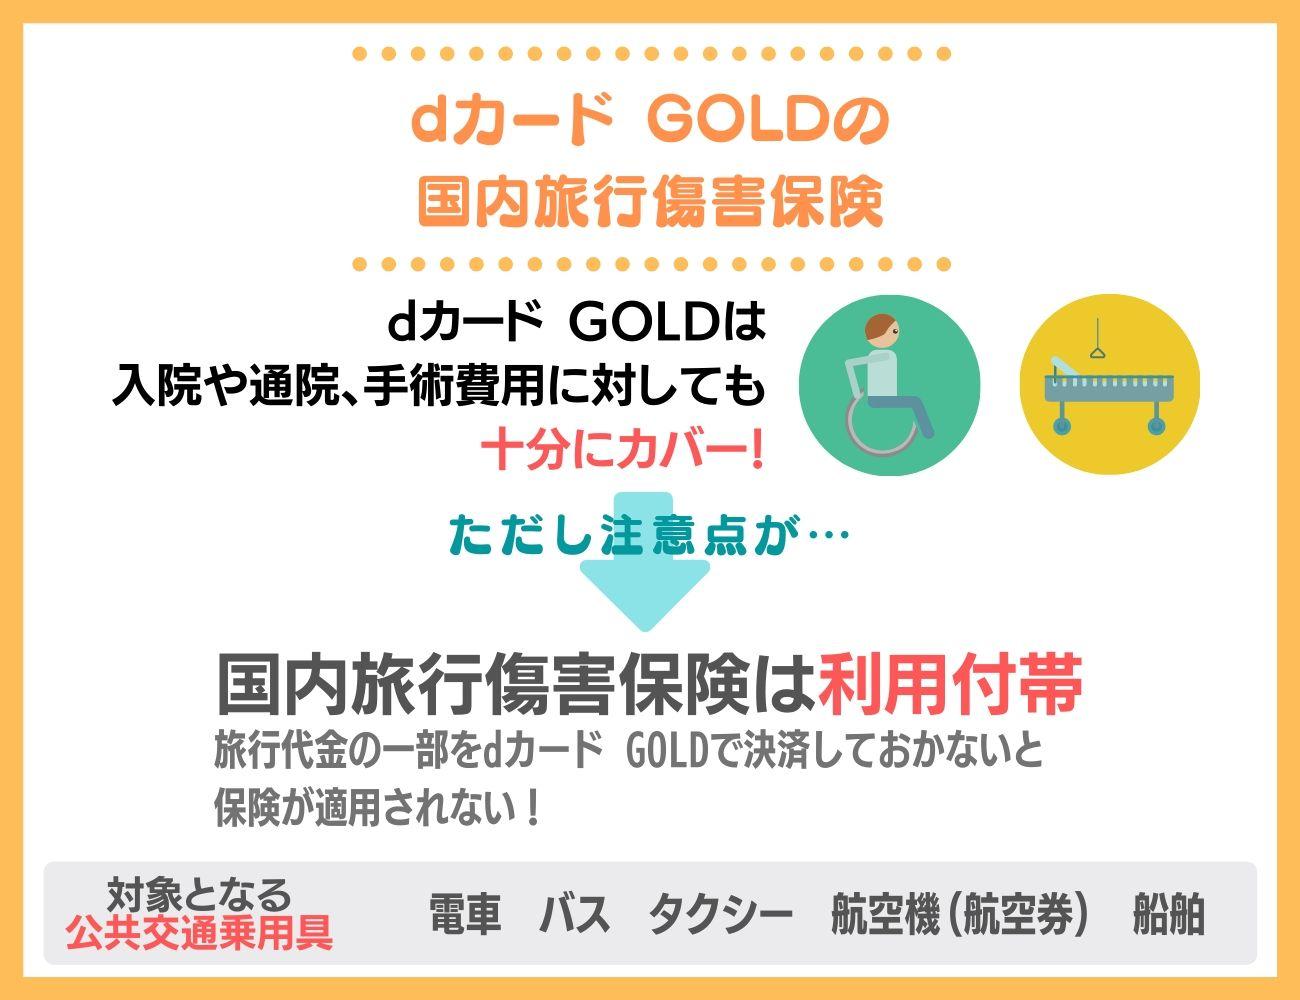 dカード GOLDの国内旅行保険も充実!